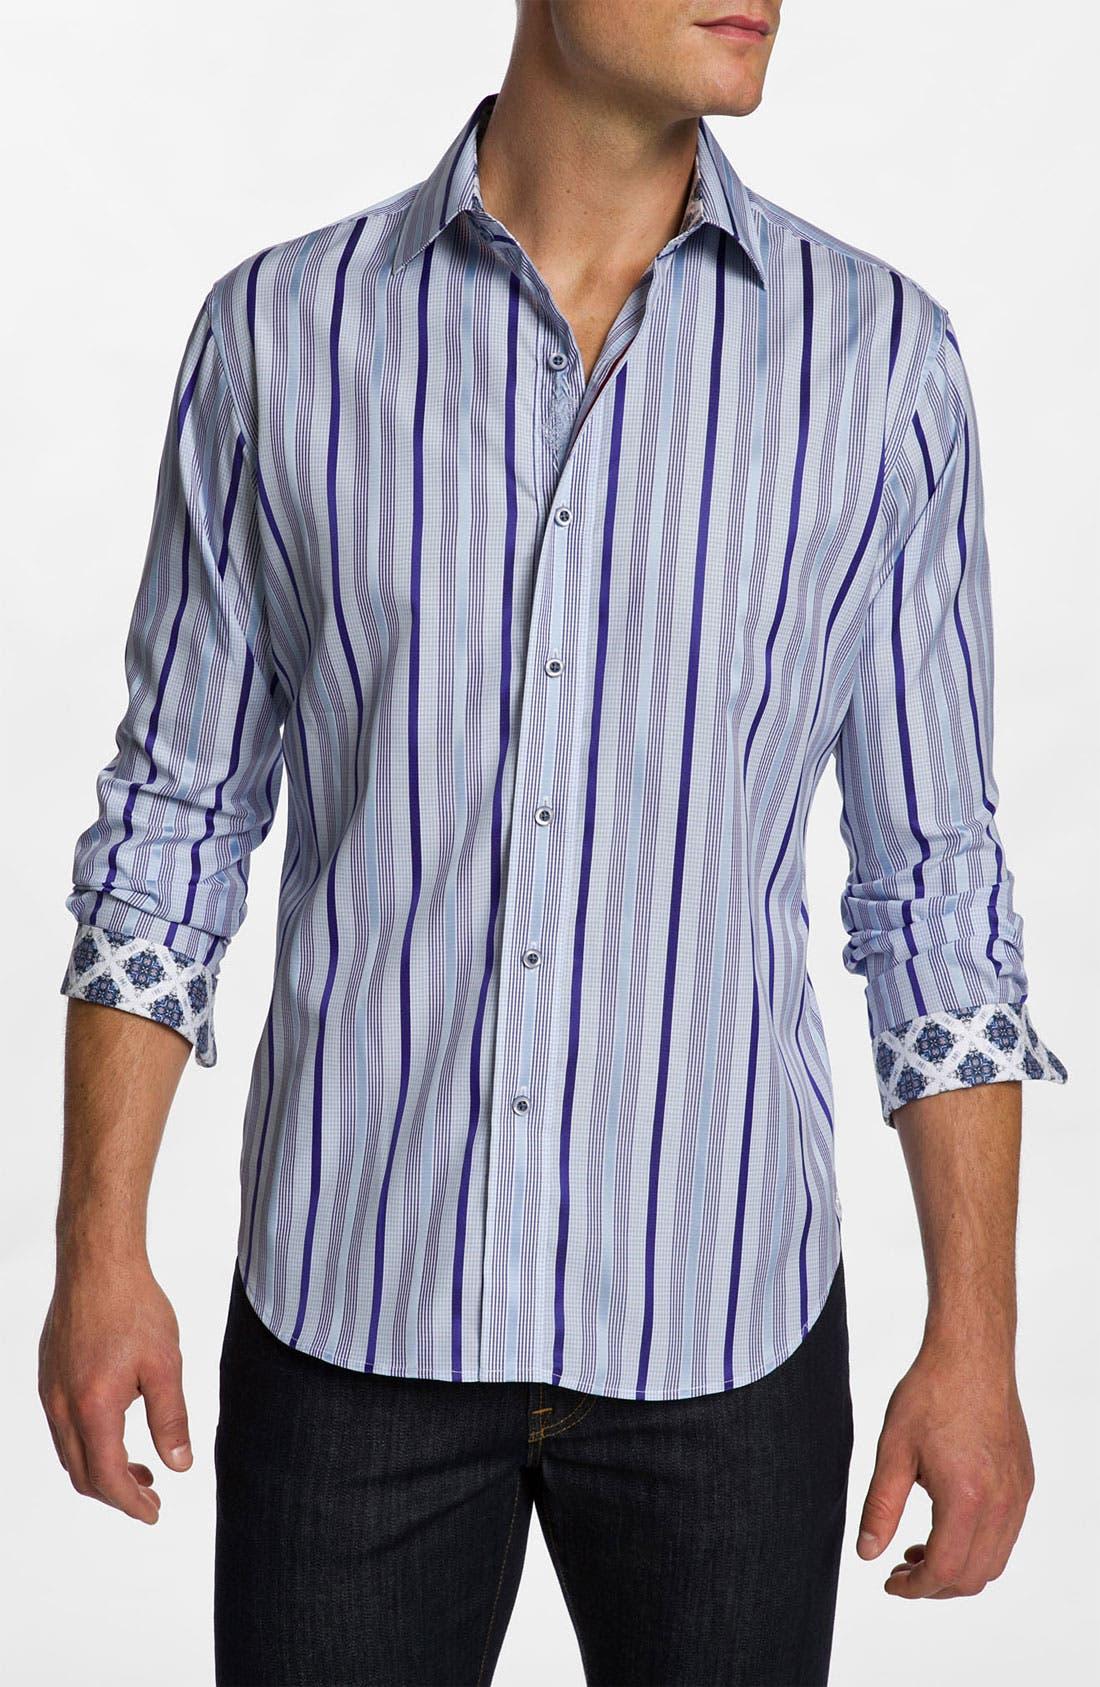 Alternate Image 1 Selected - Robert Graham 'Buckingham' Sport Shirt